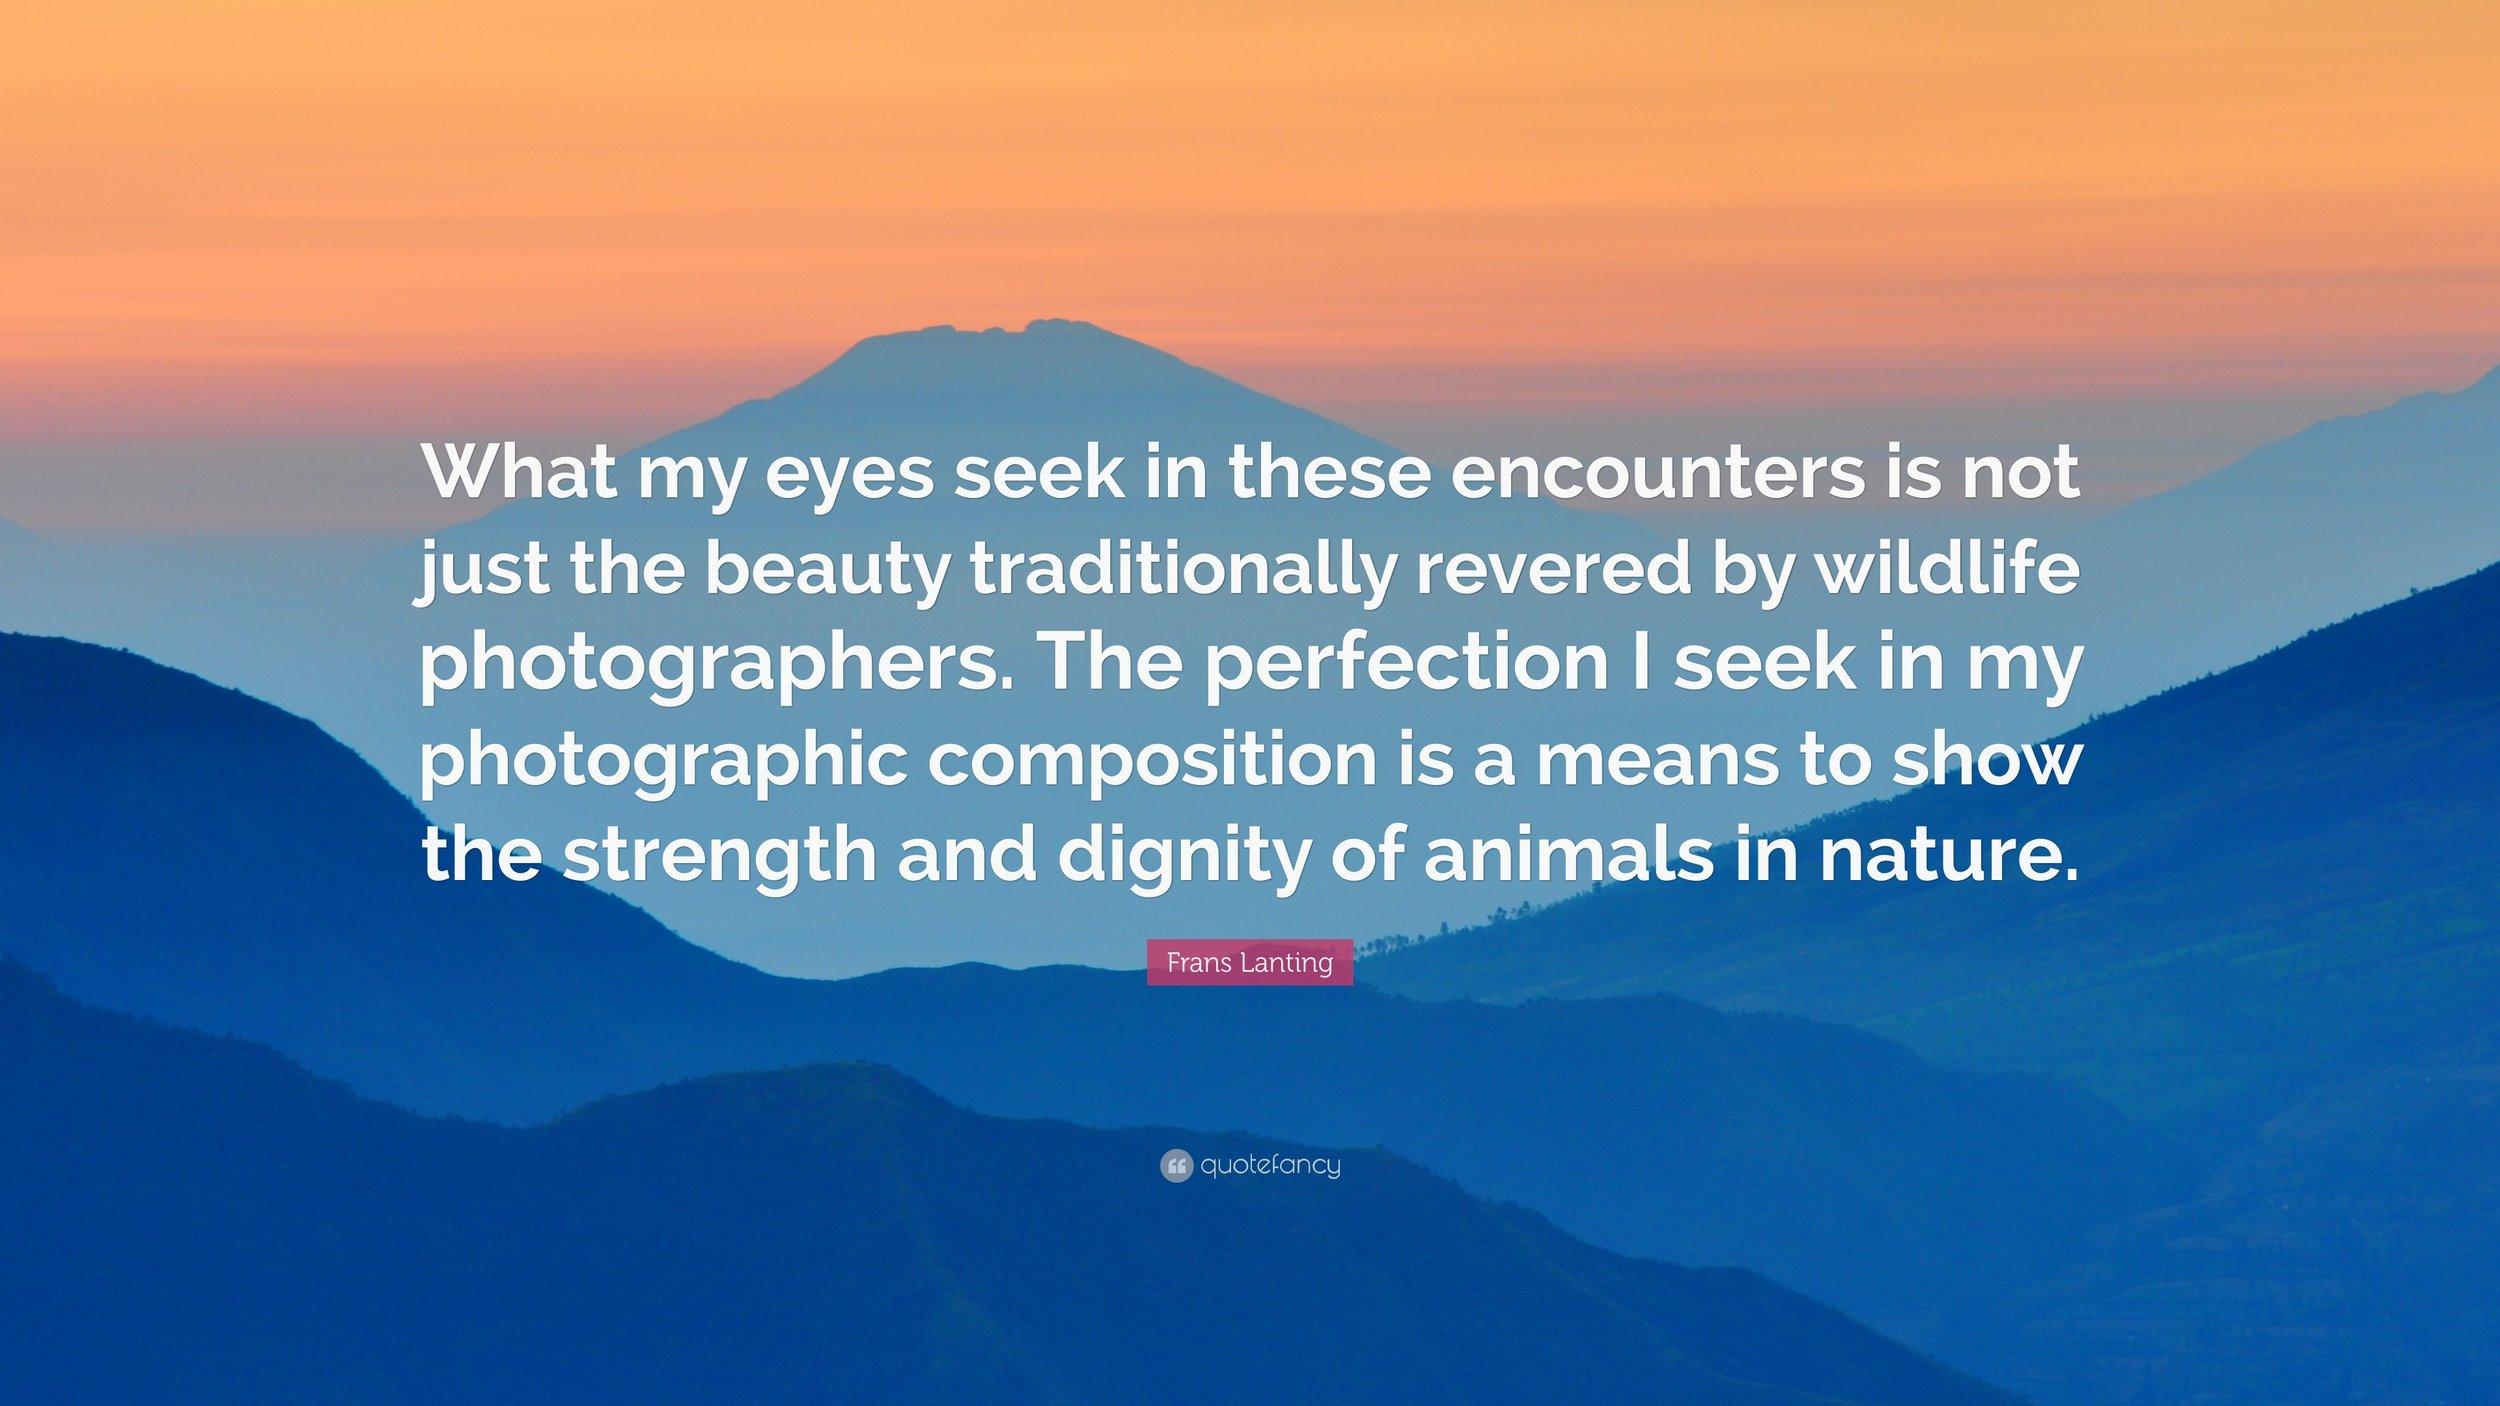 7. 1579153-Frans-Lanting-Quote-What-my-eyes-seek-in-these-encounters-is-not.jpg